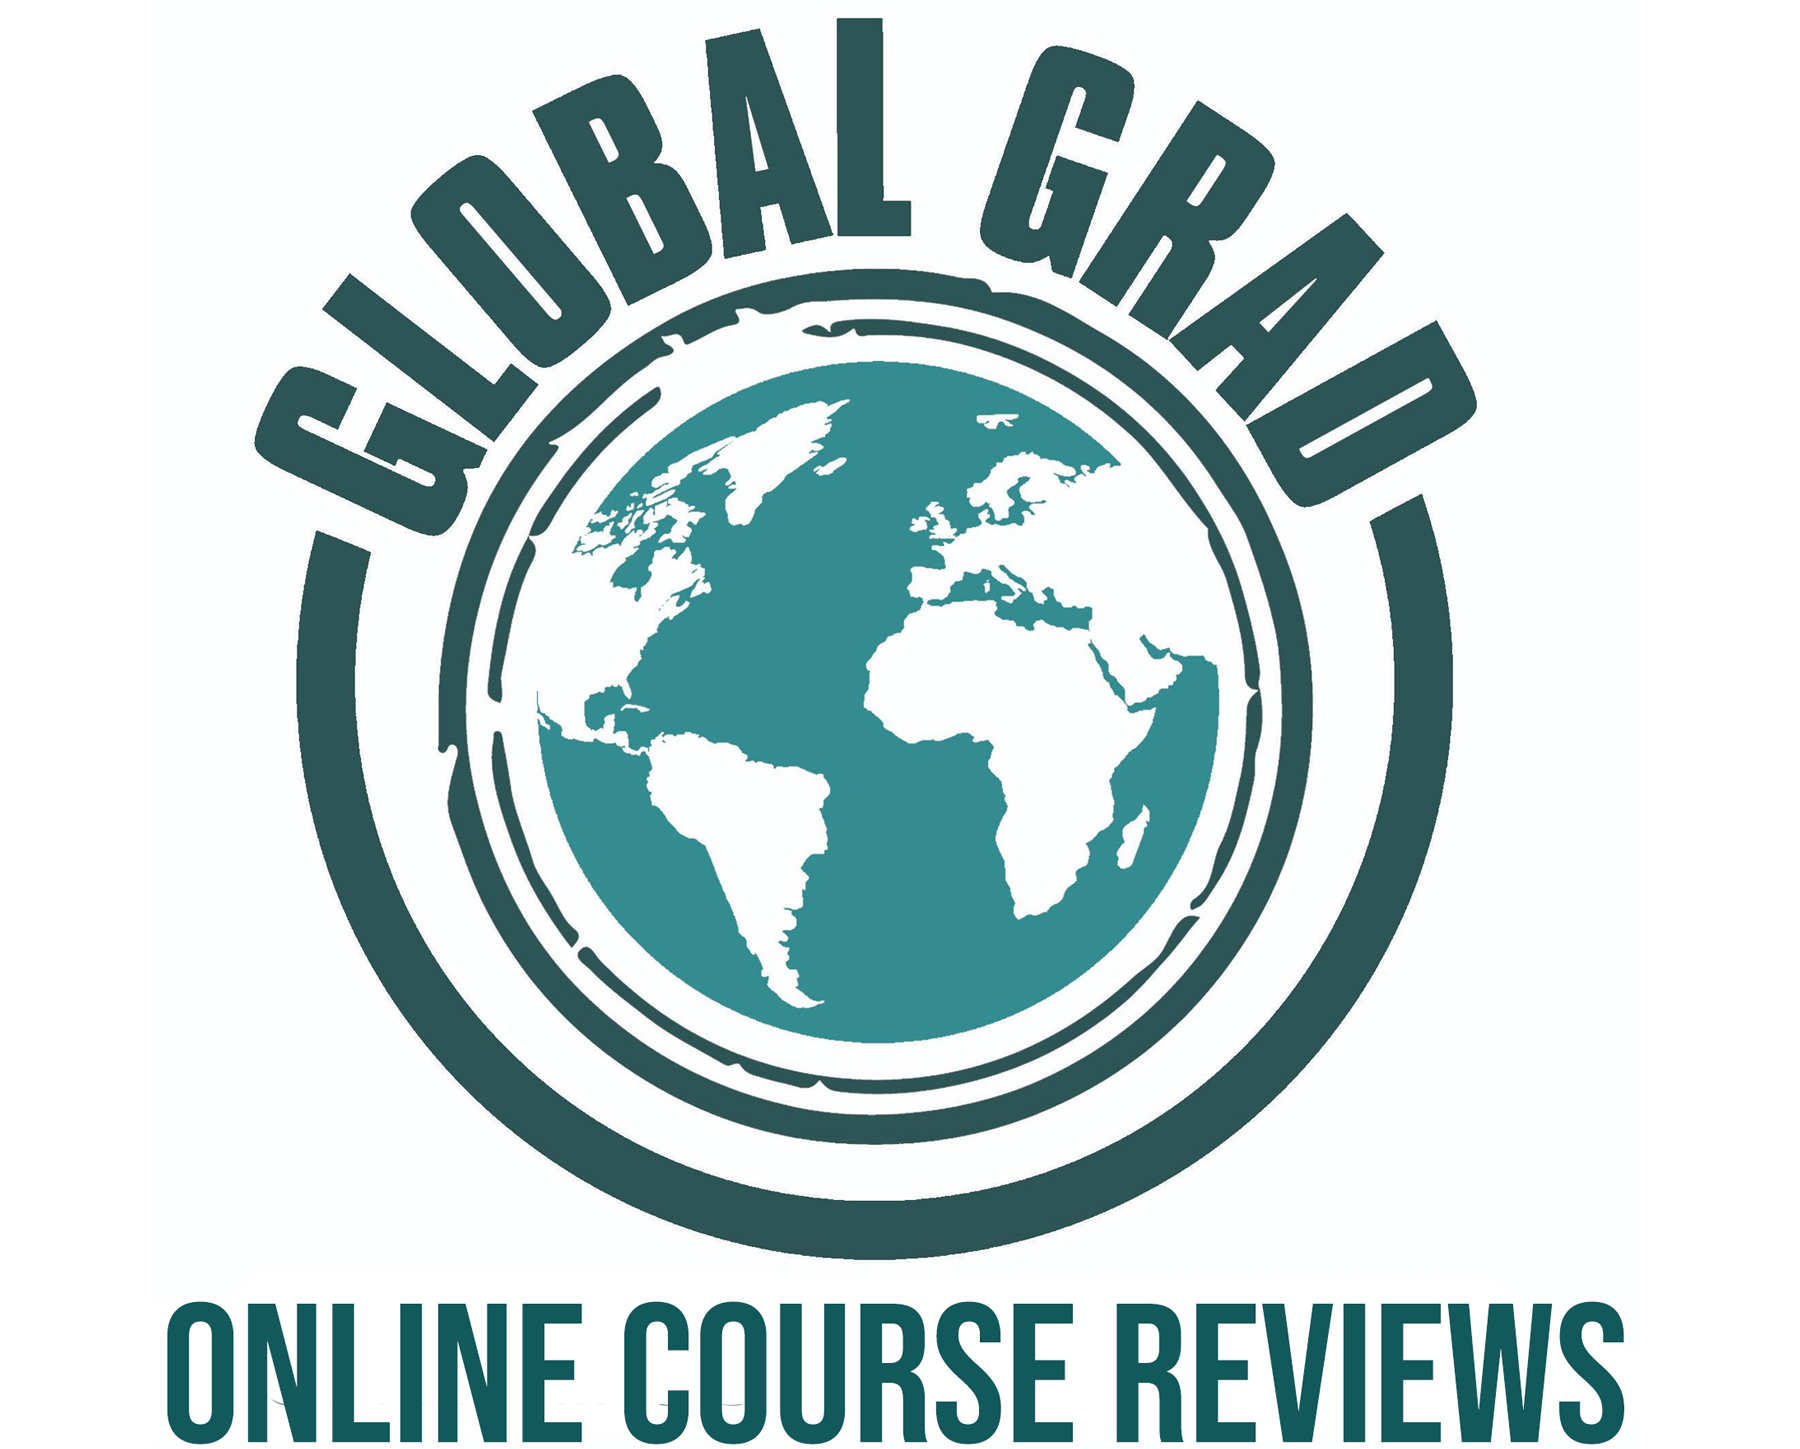 Online Course Reviews